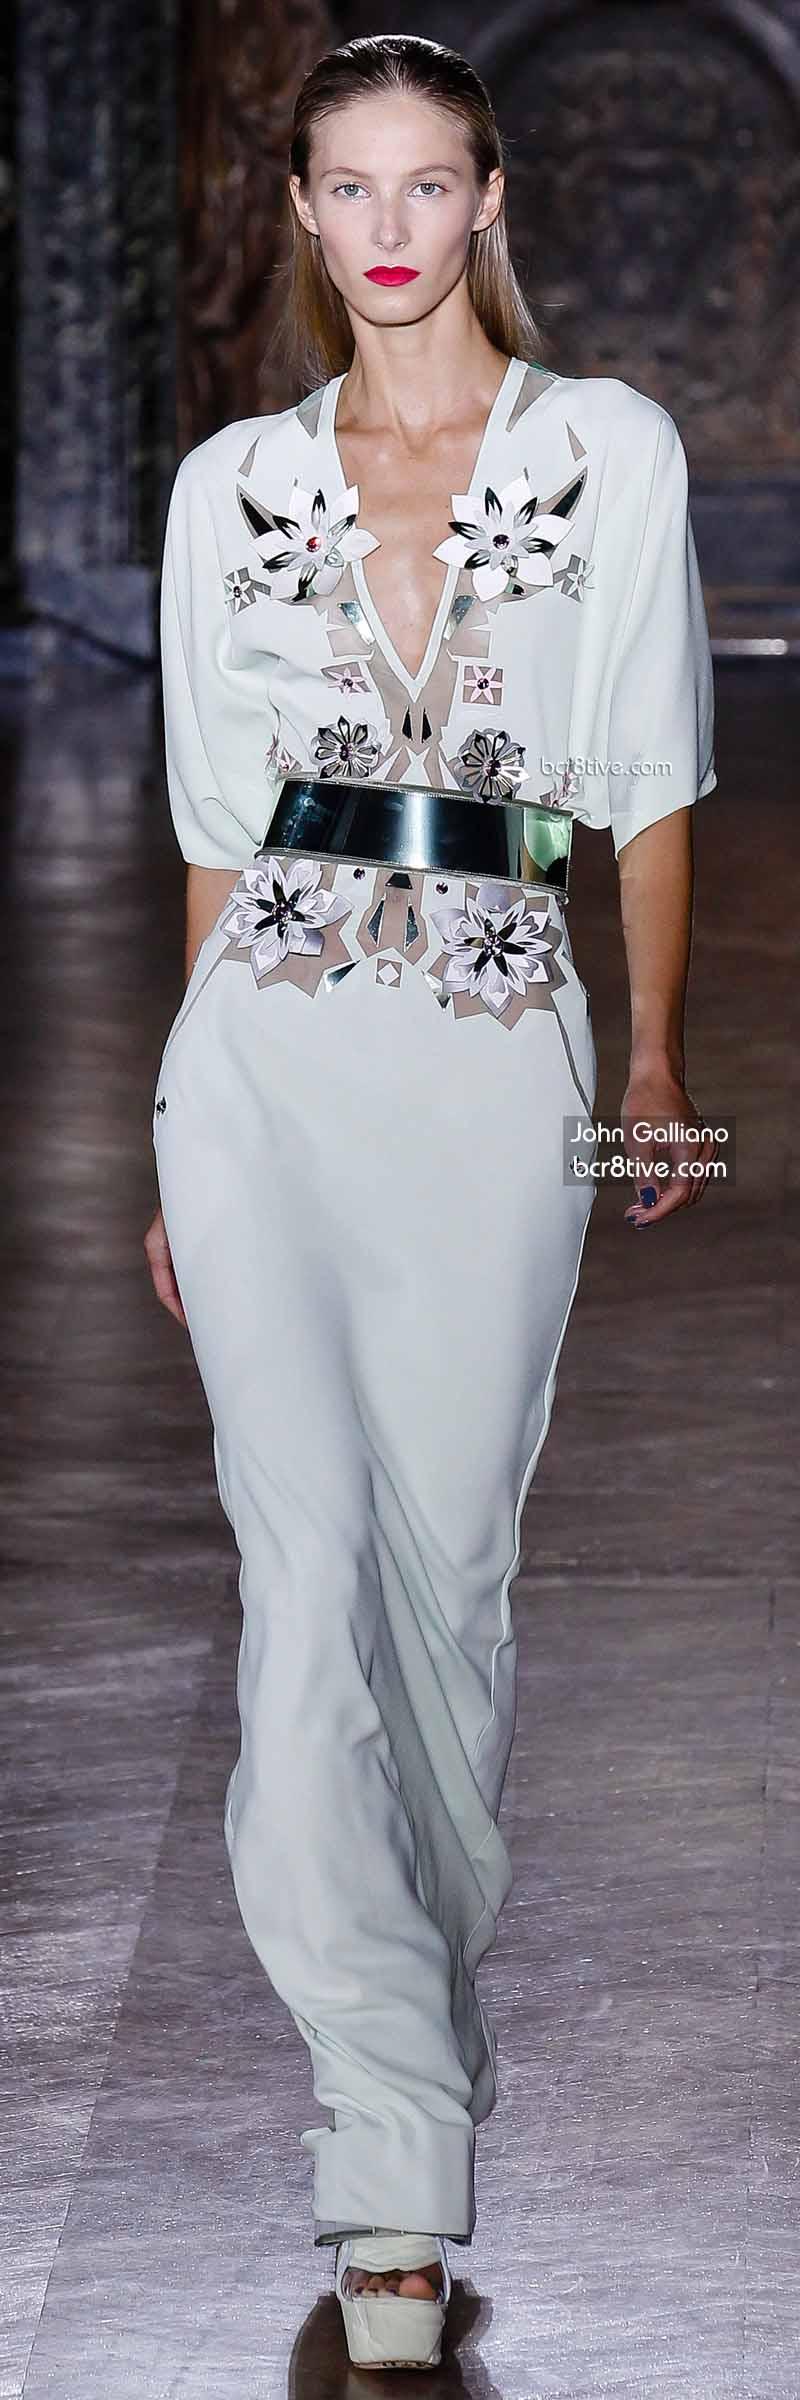 John Galliano Evening Gown